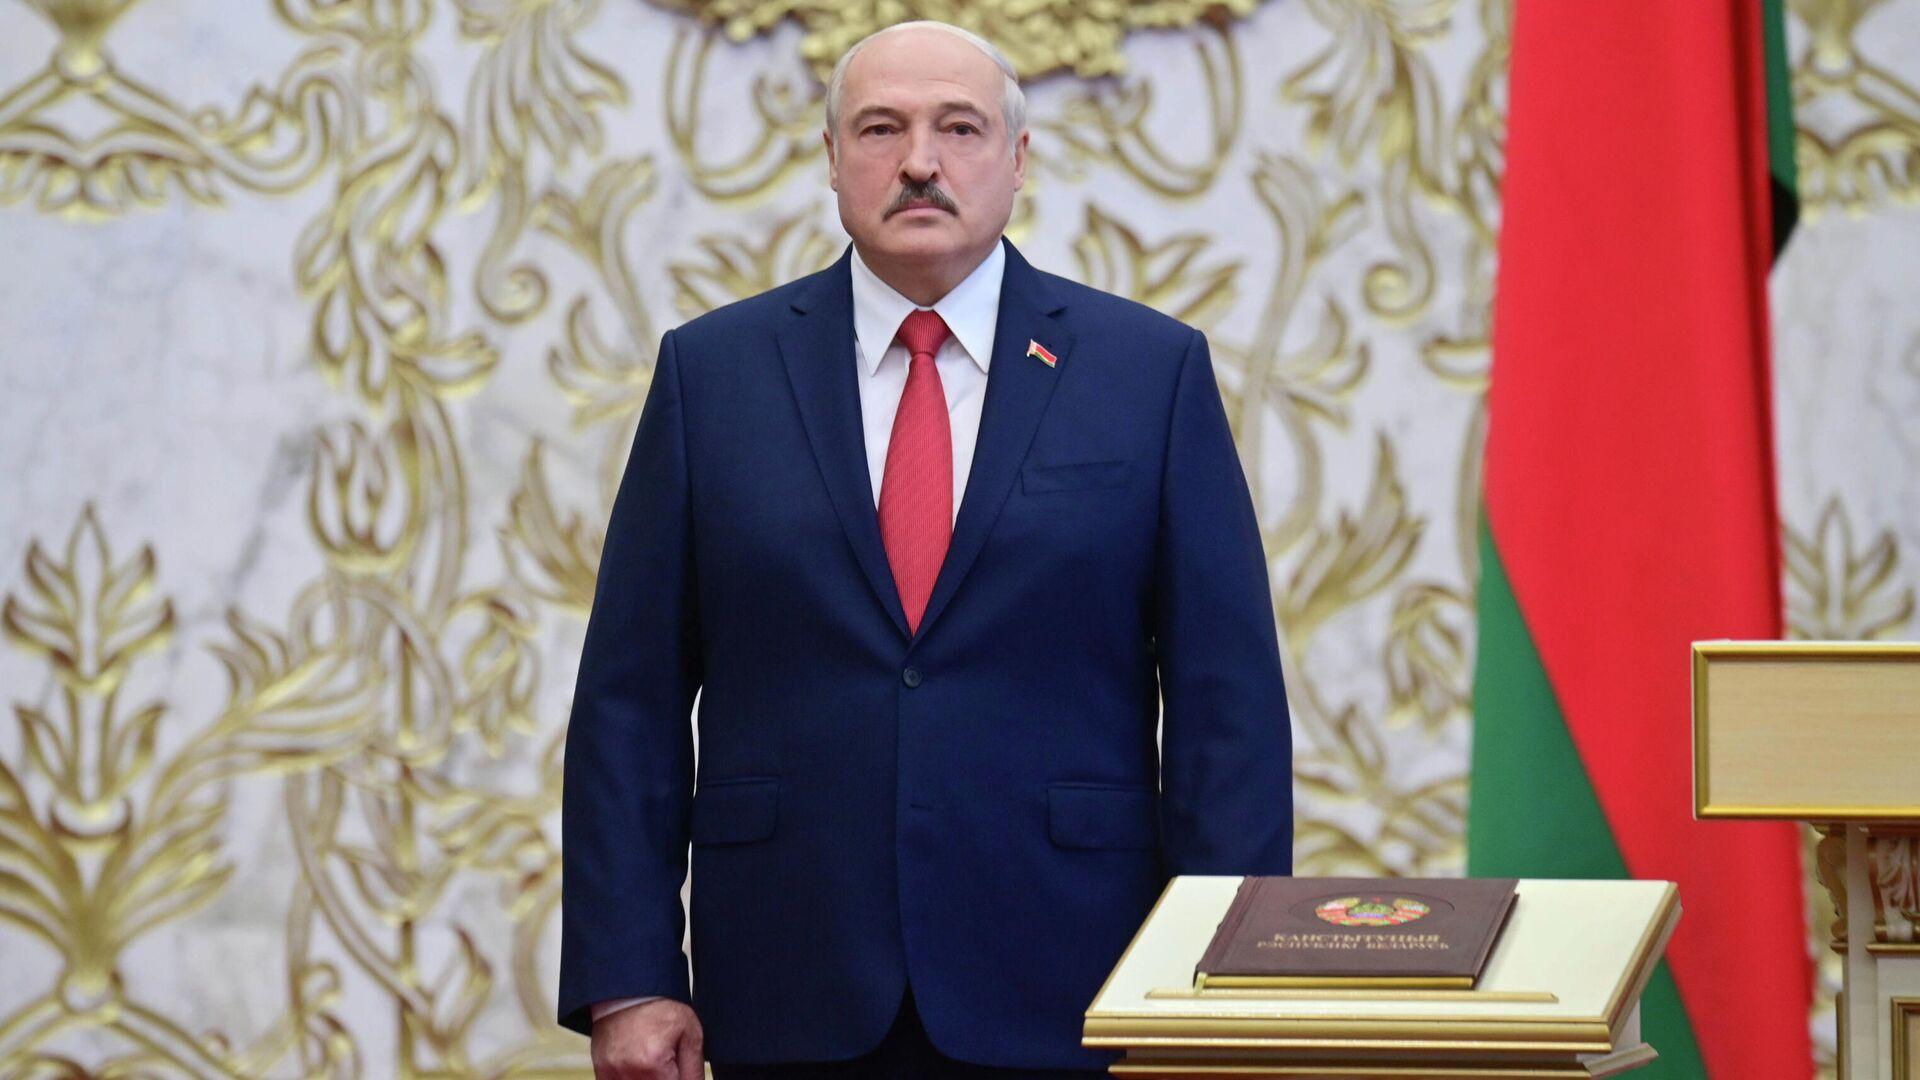 Президент Белоруссии Александр Лукашенко на церемонии инаугурации в Минске - РИА Новости, 1920, 27.09.2020